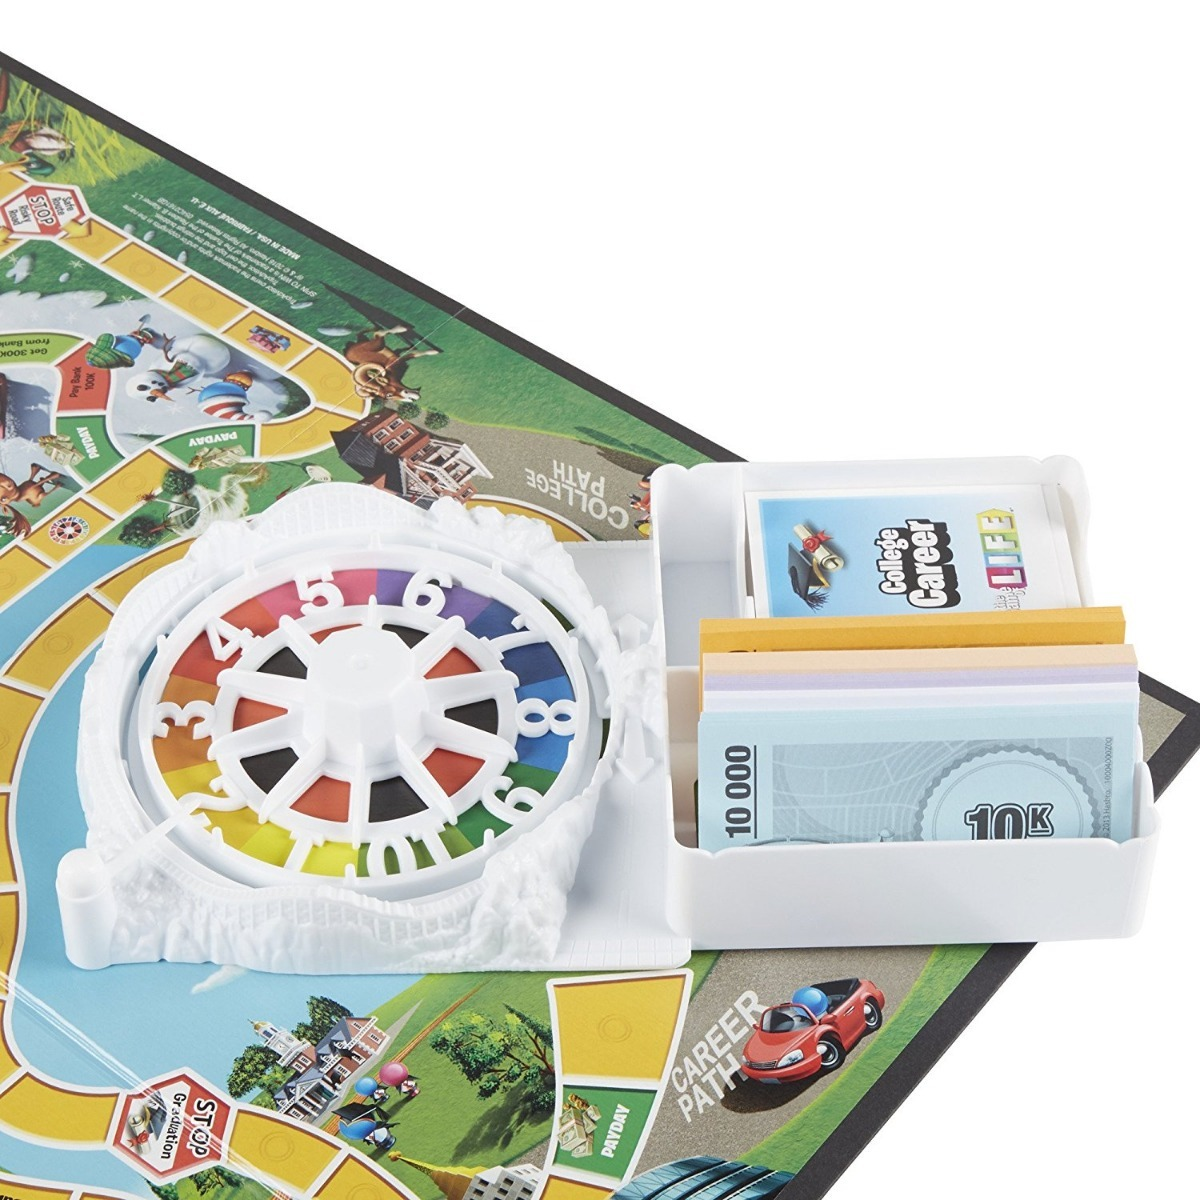 Juego De Mesa Game Of Life Board Game Nuevo Ingles Dhl